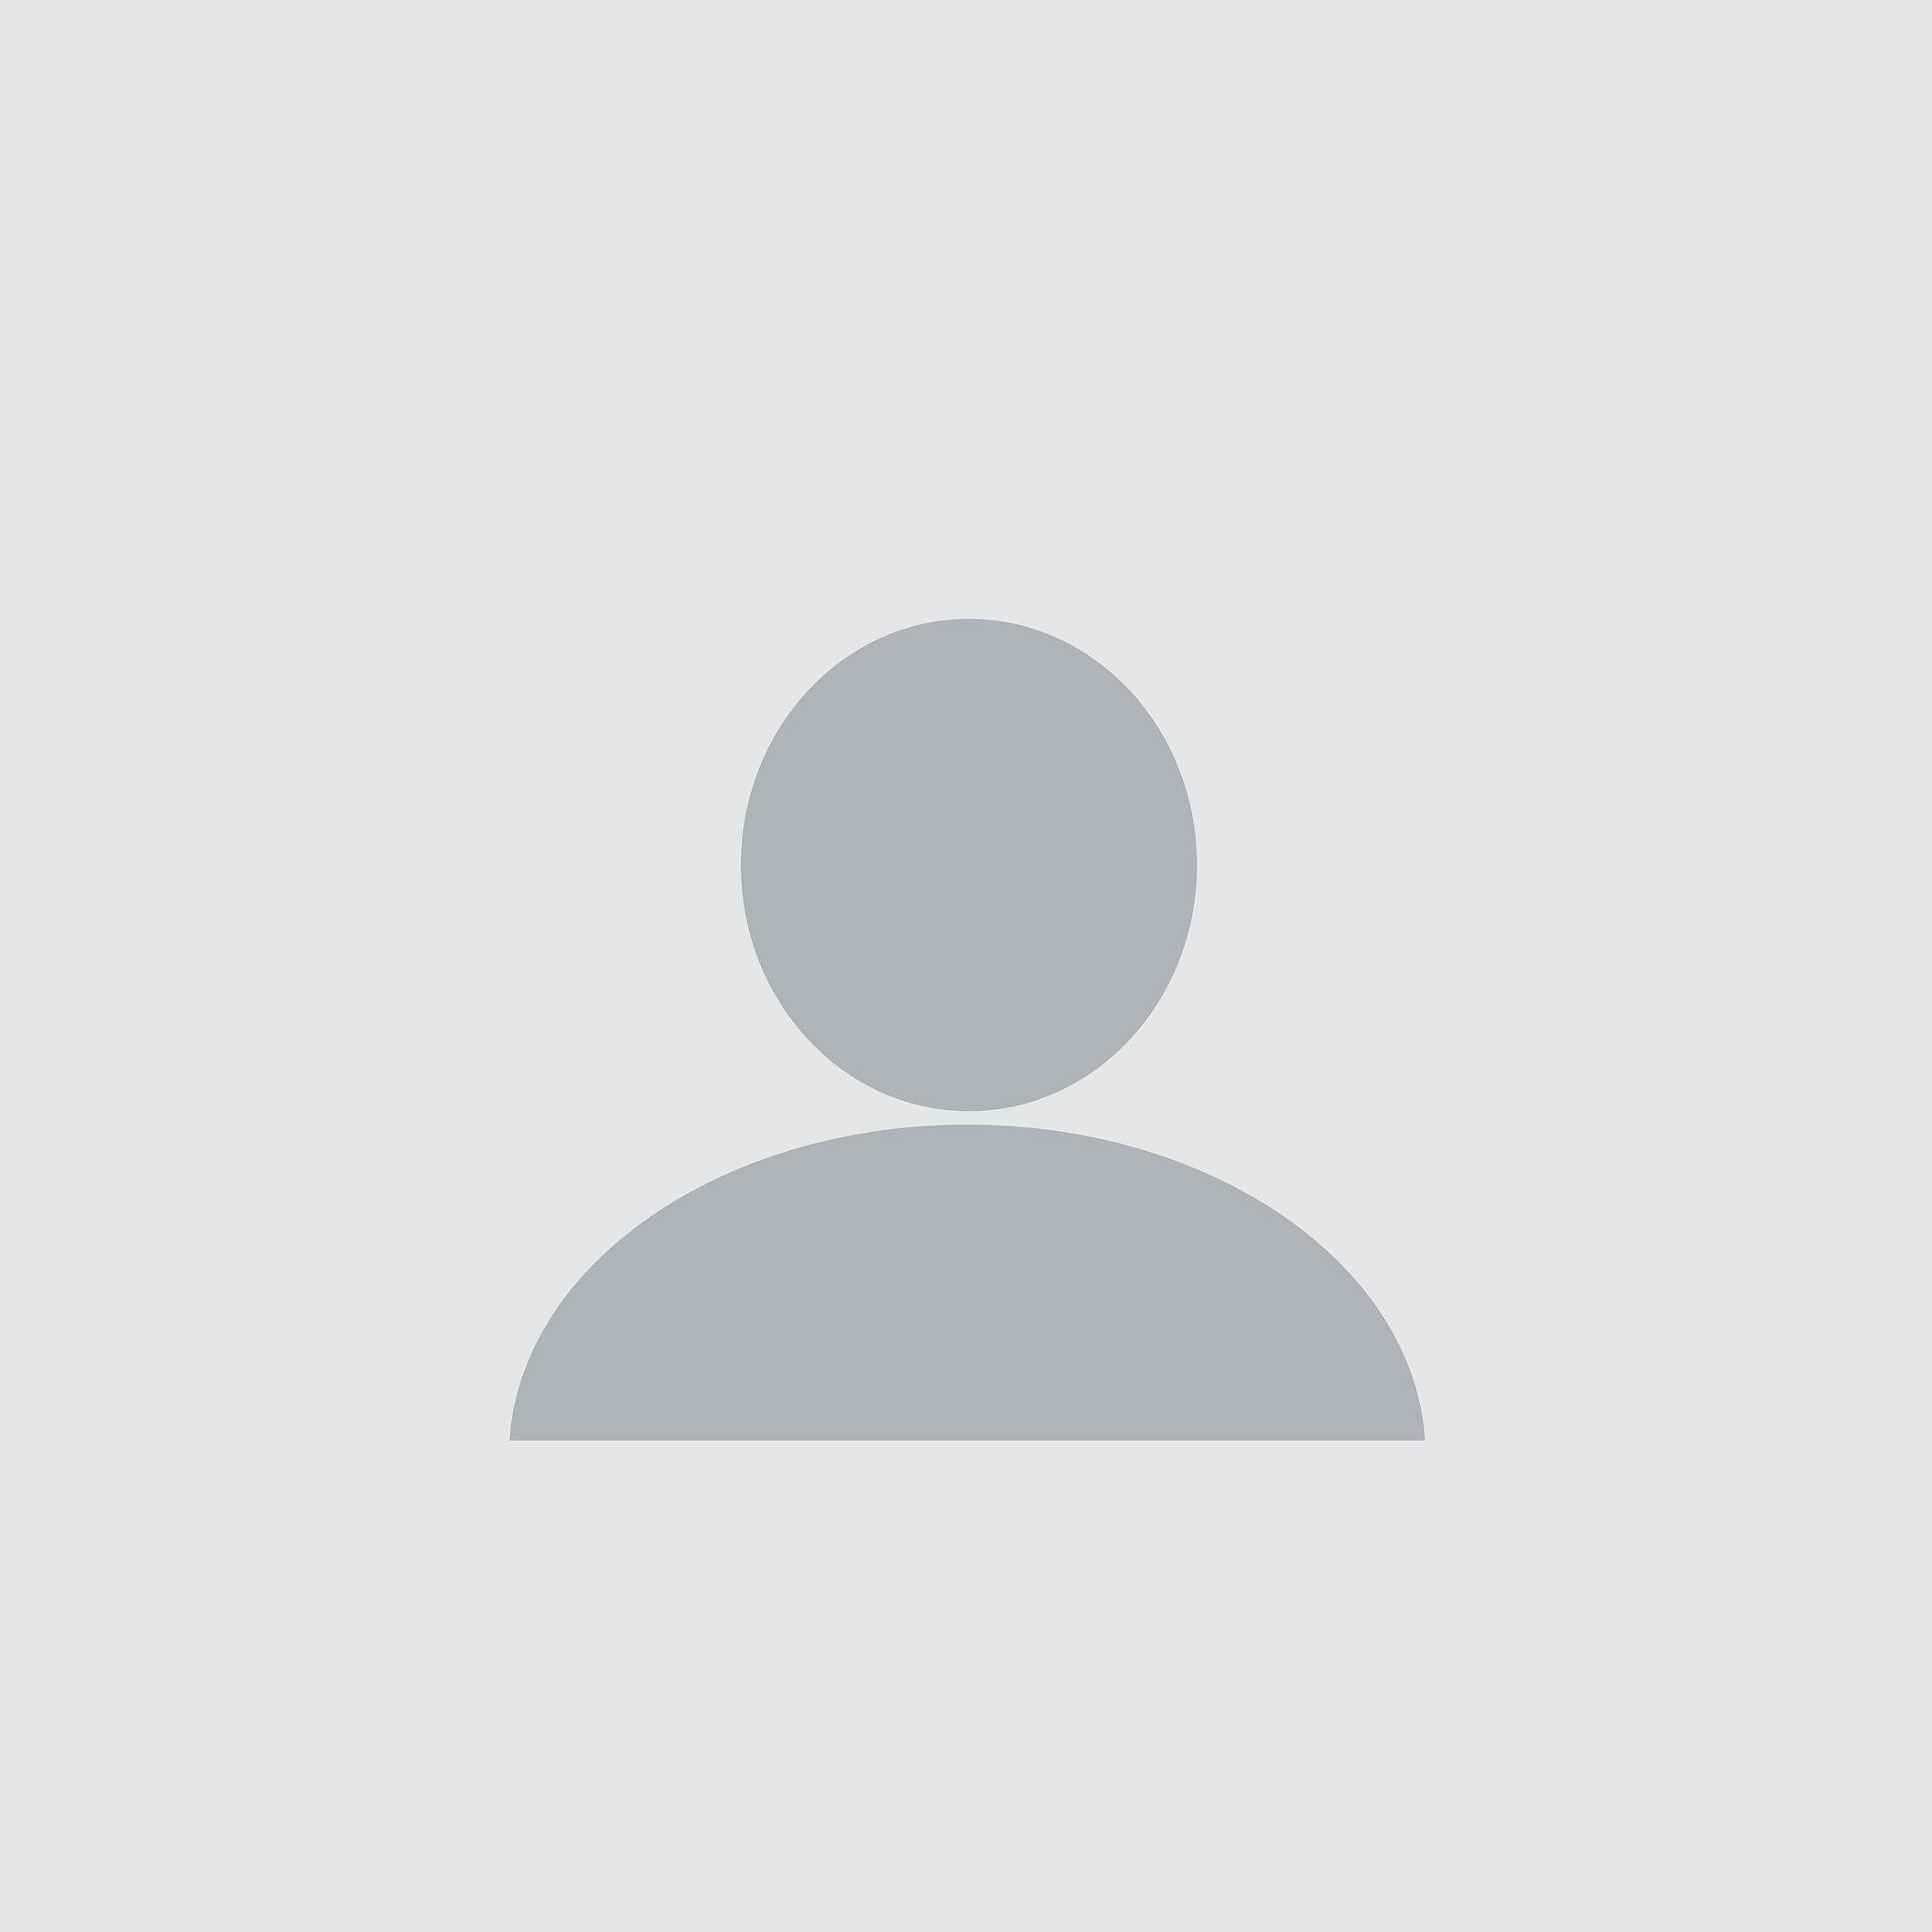 blank-profile-picture-973460_1280.jpg